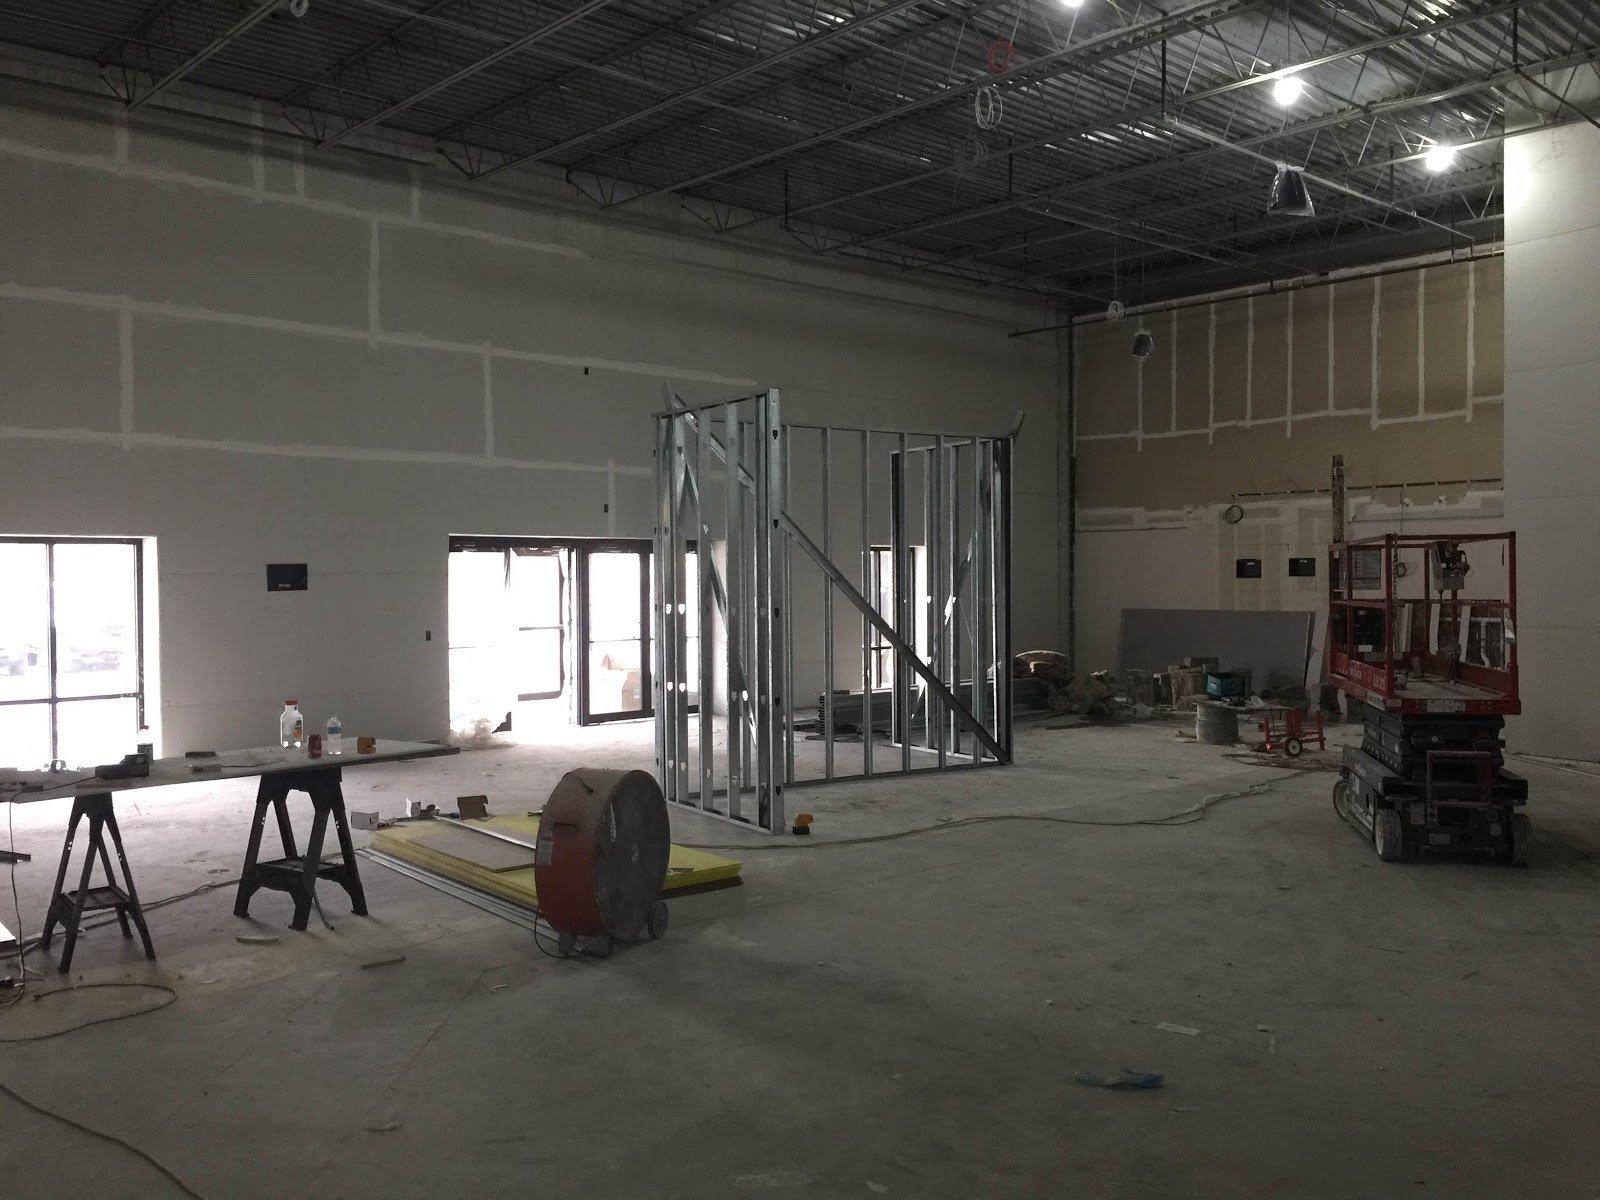 Zone 6 fitness kansas city interior design studio tran thomas for Kansas city interior designers